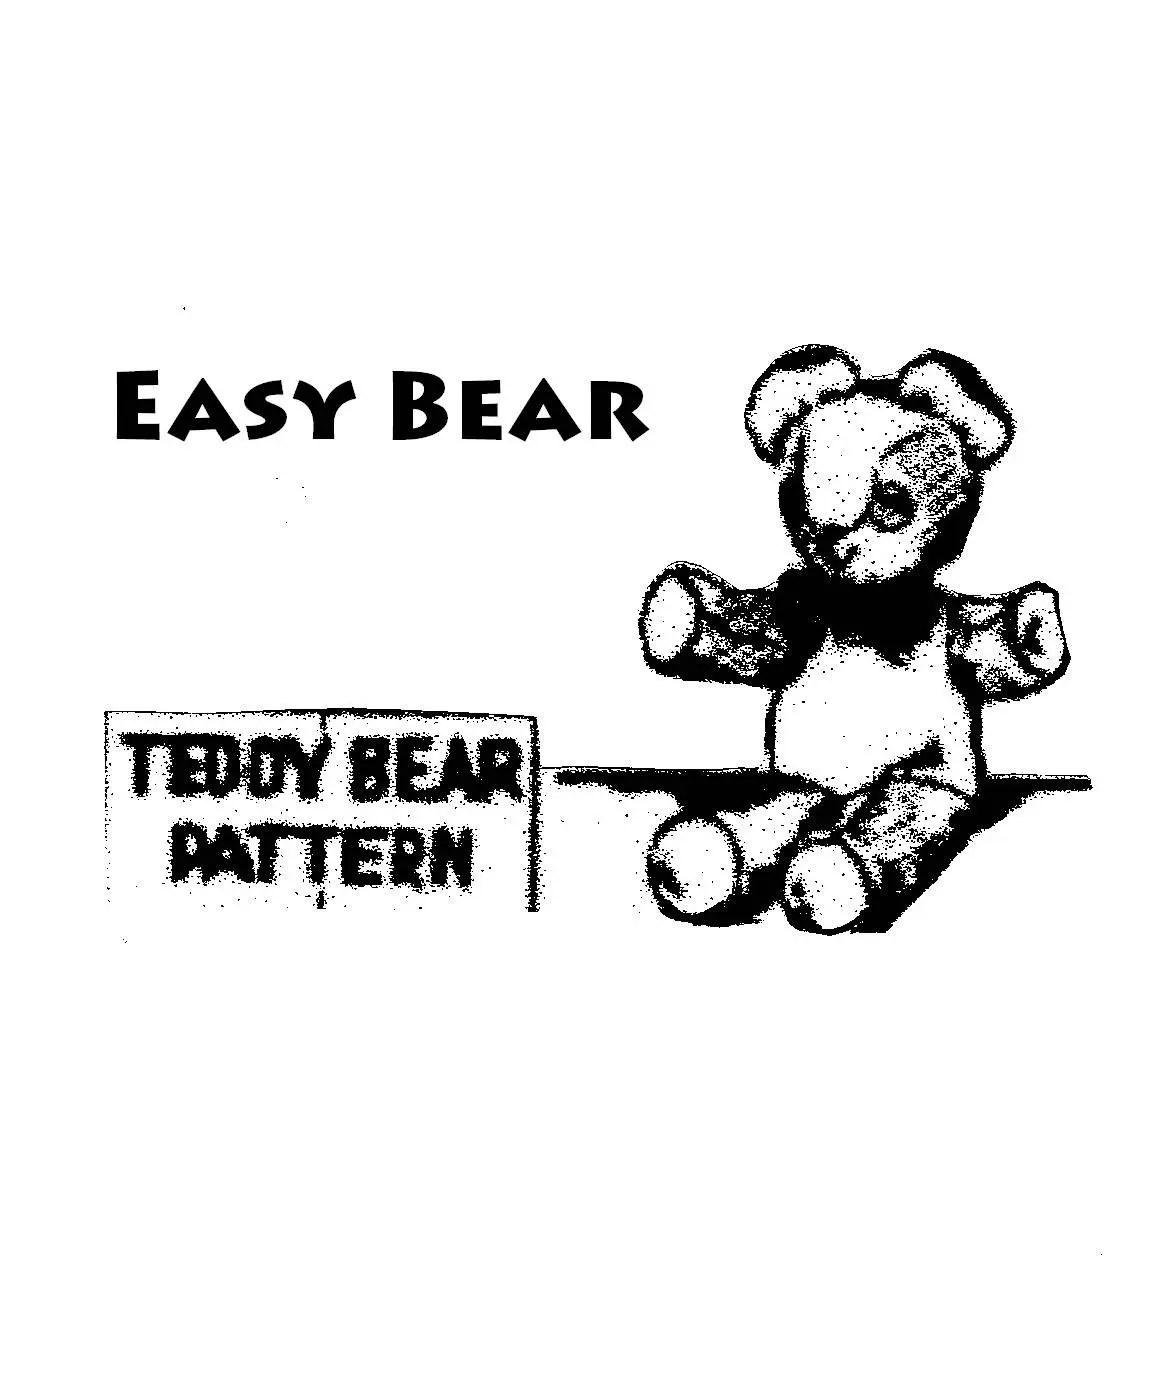 Old Fashioned Teddy Bear Sewing Pattern Easy